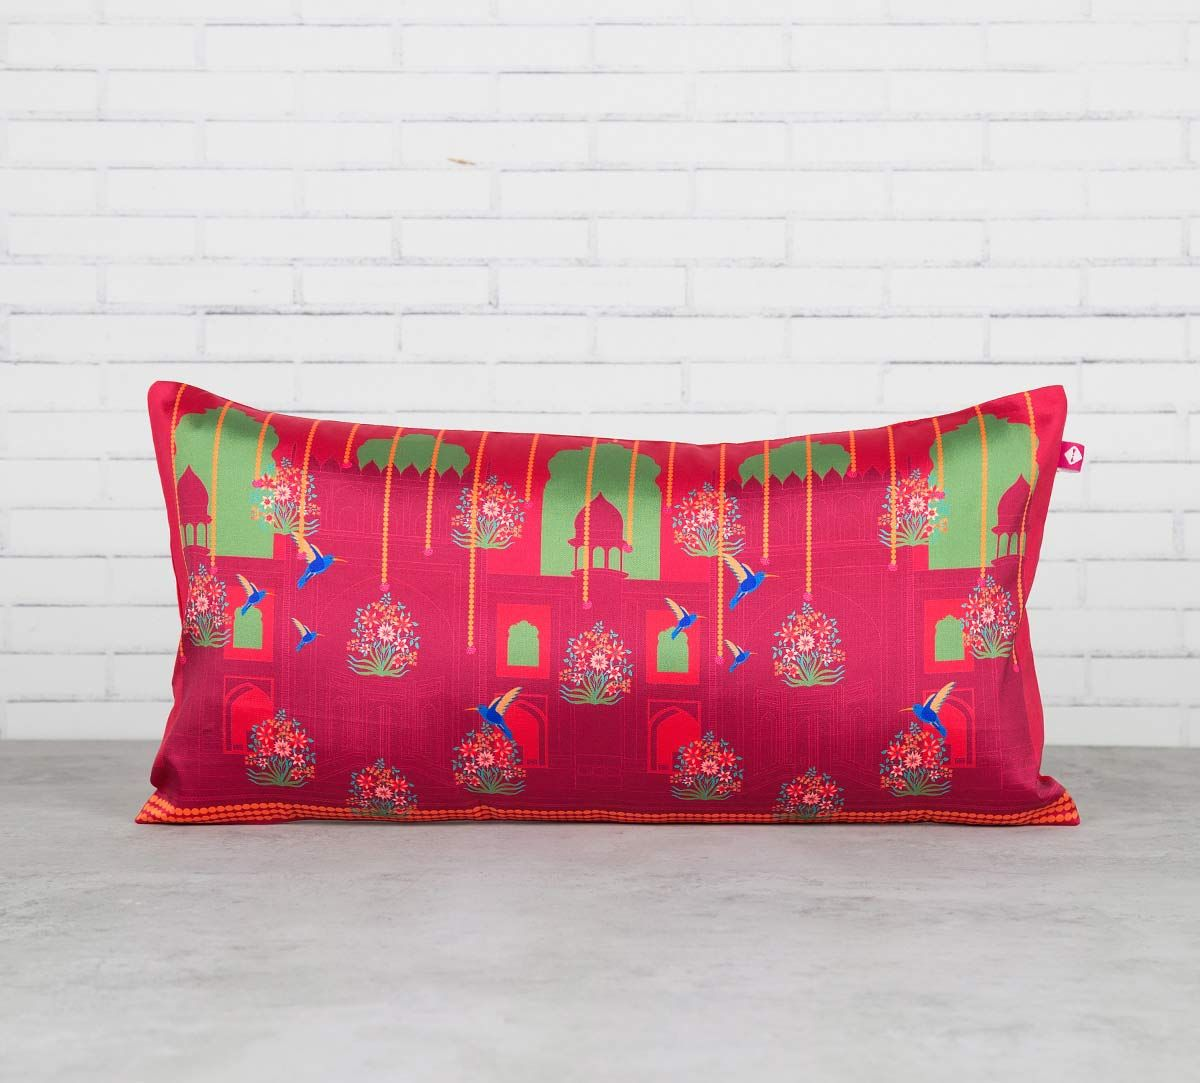 India Circus Passerines Palatial Paradise Blended Taf Silk Cushion Cover